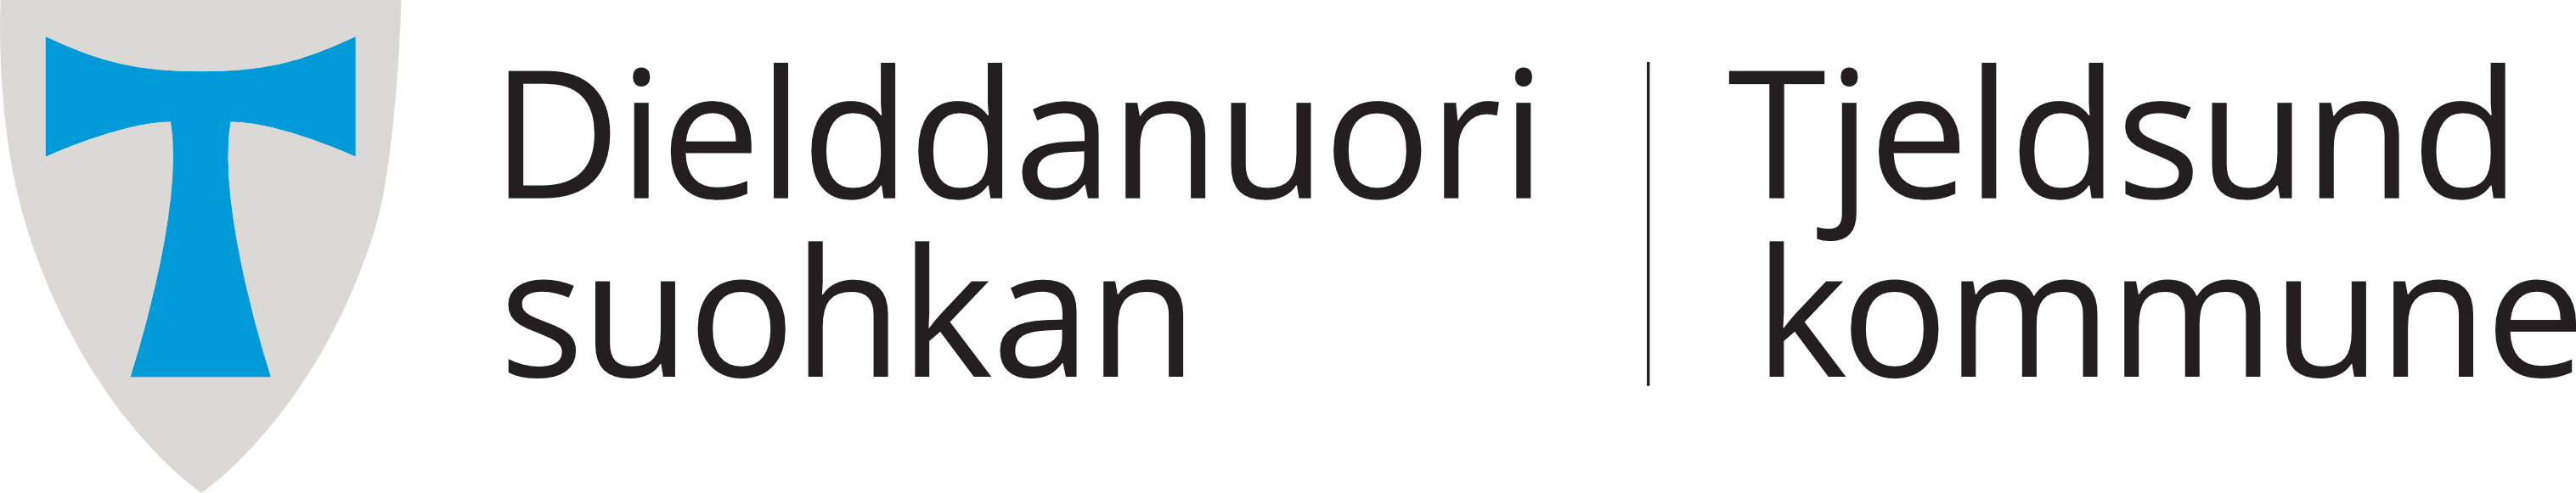 Dielddanuori suohkan - Tjeldsund kommune